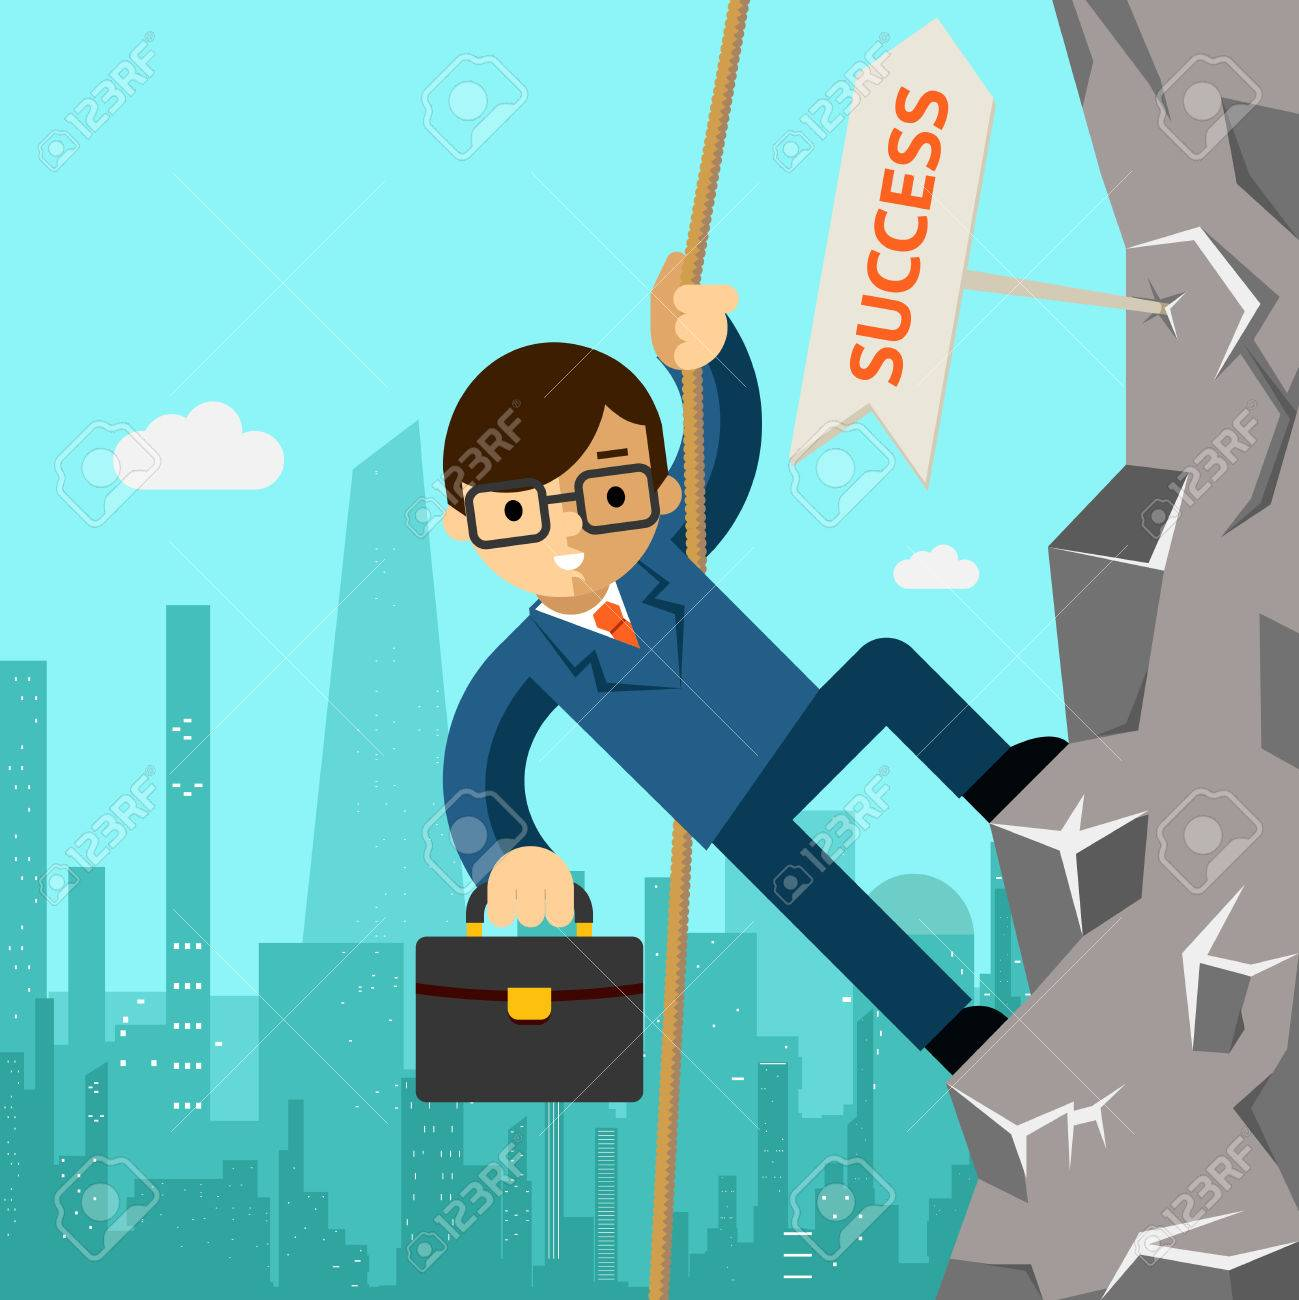 Way success. Businessman aspires to leadership - 38901898